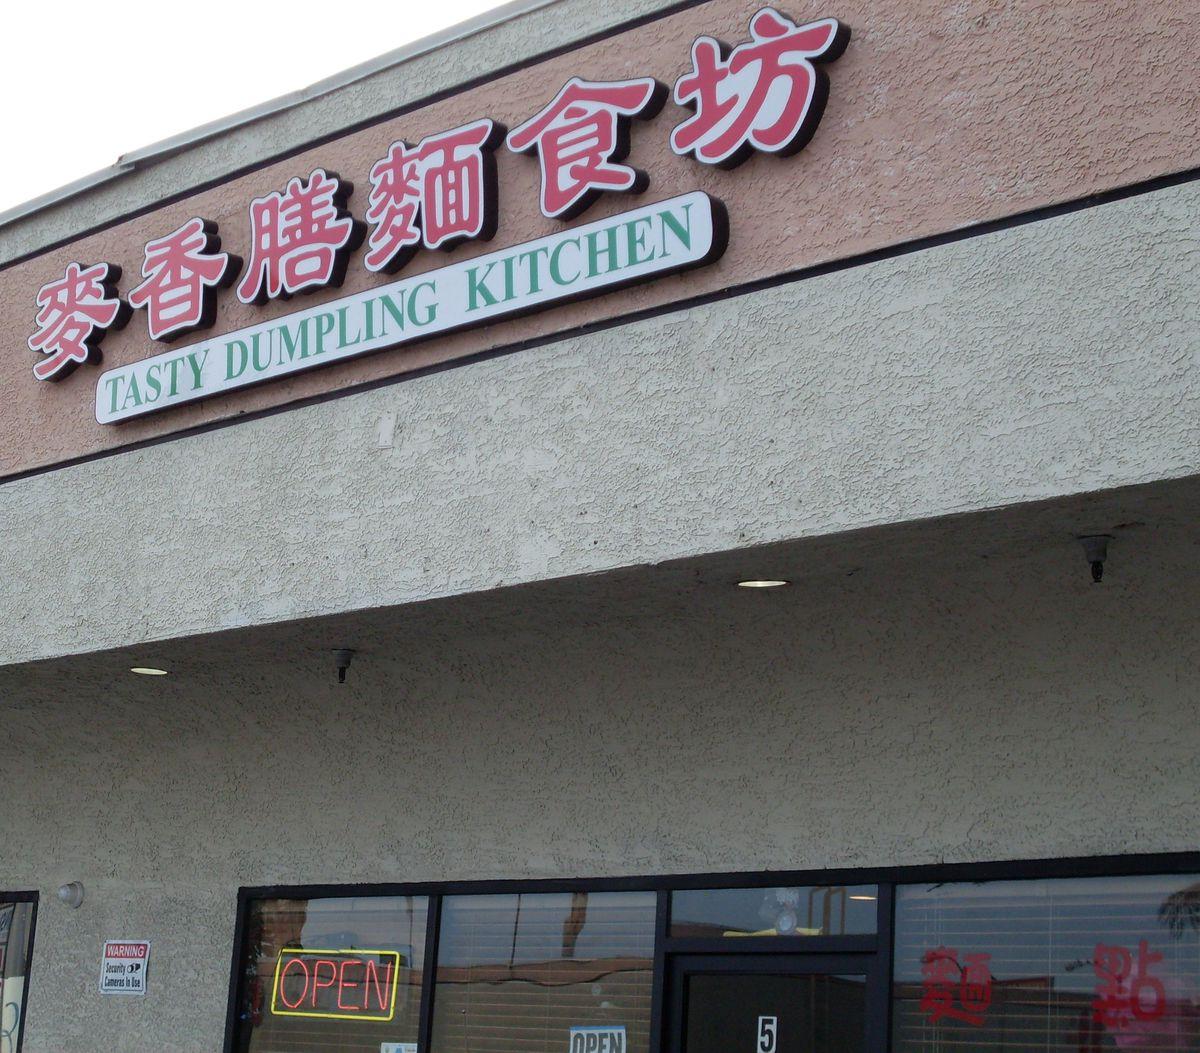 Tasty Dumpling Kitchen